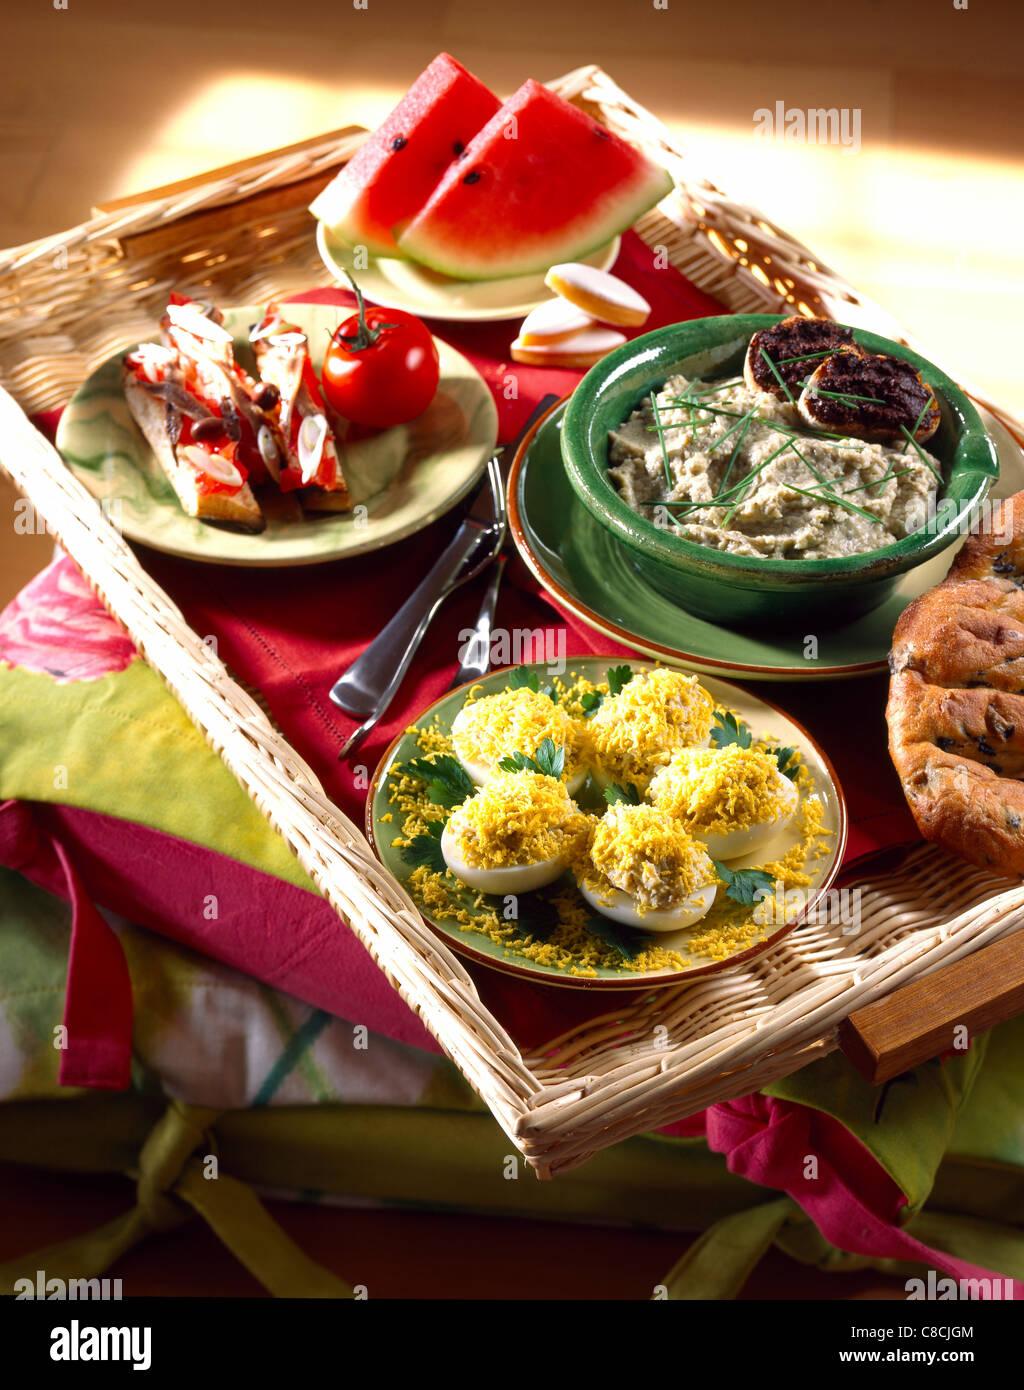 Provençal TV dinner tray - Stock Image